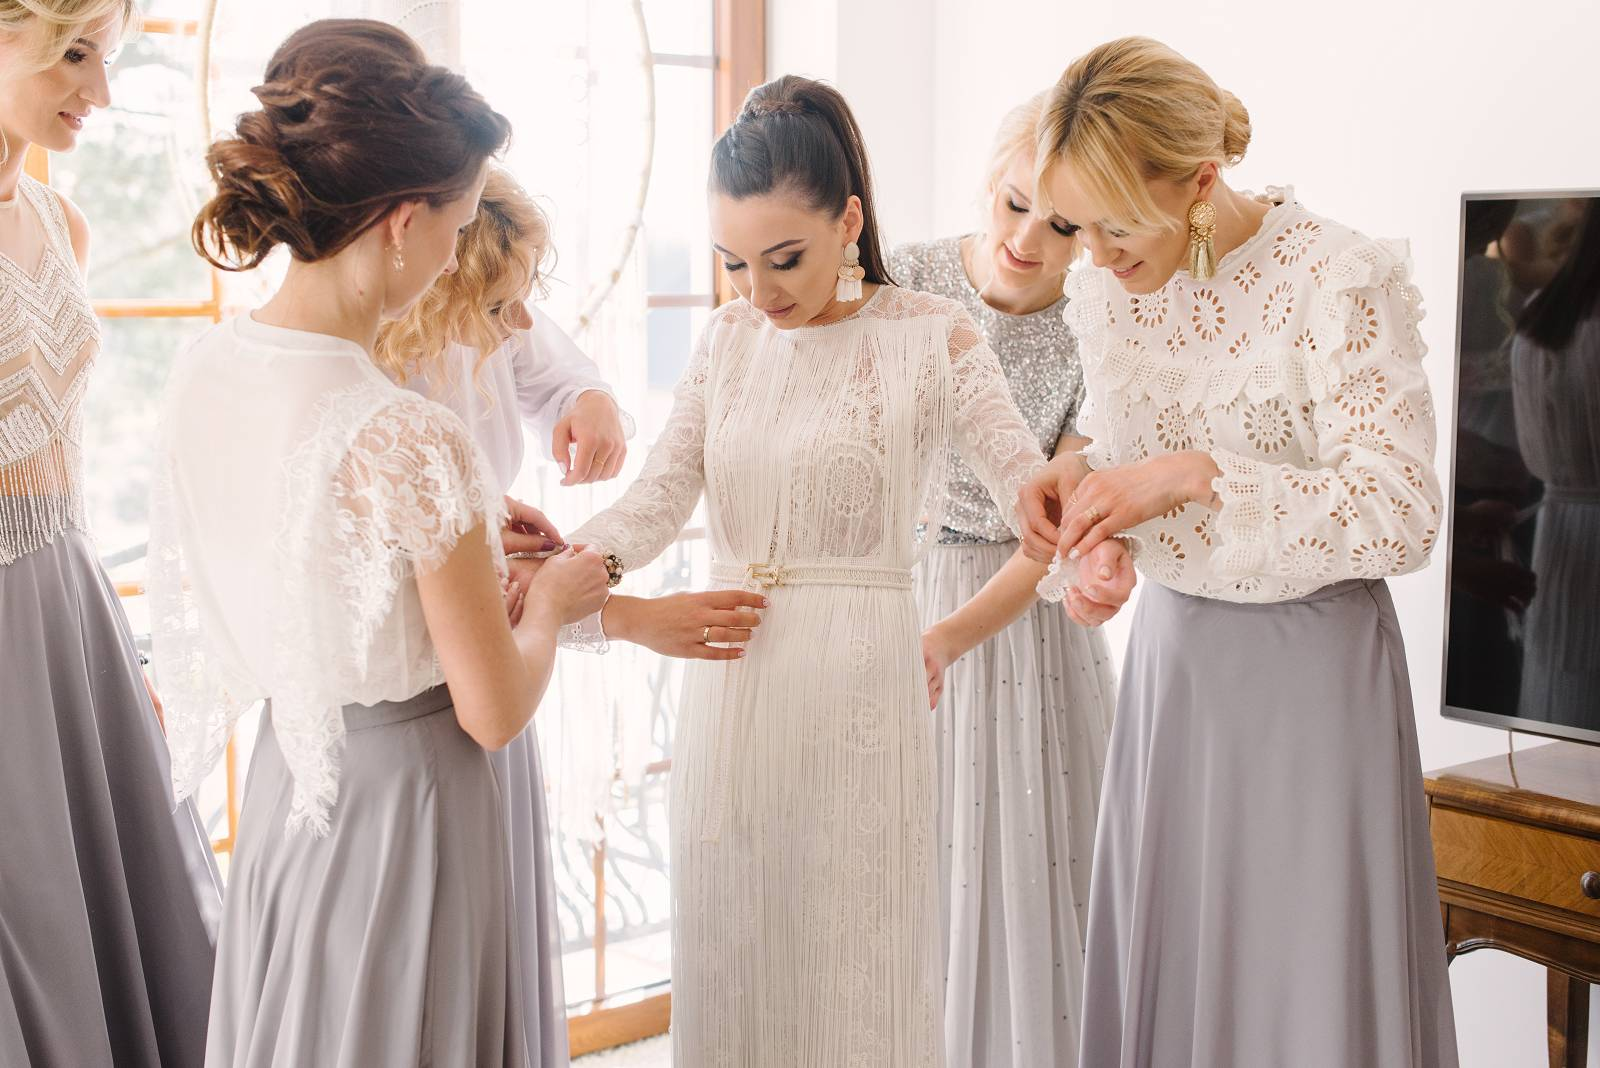 Organizacja ślubu iwesela